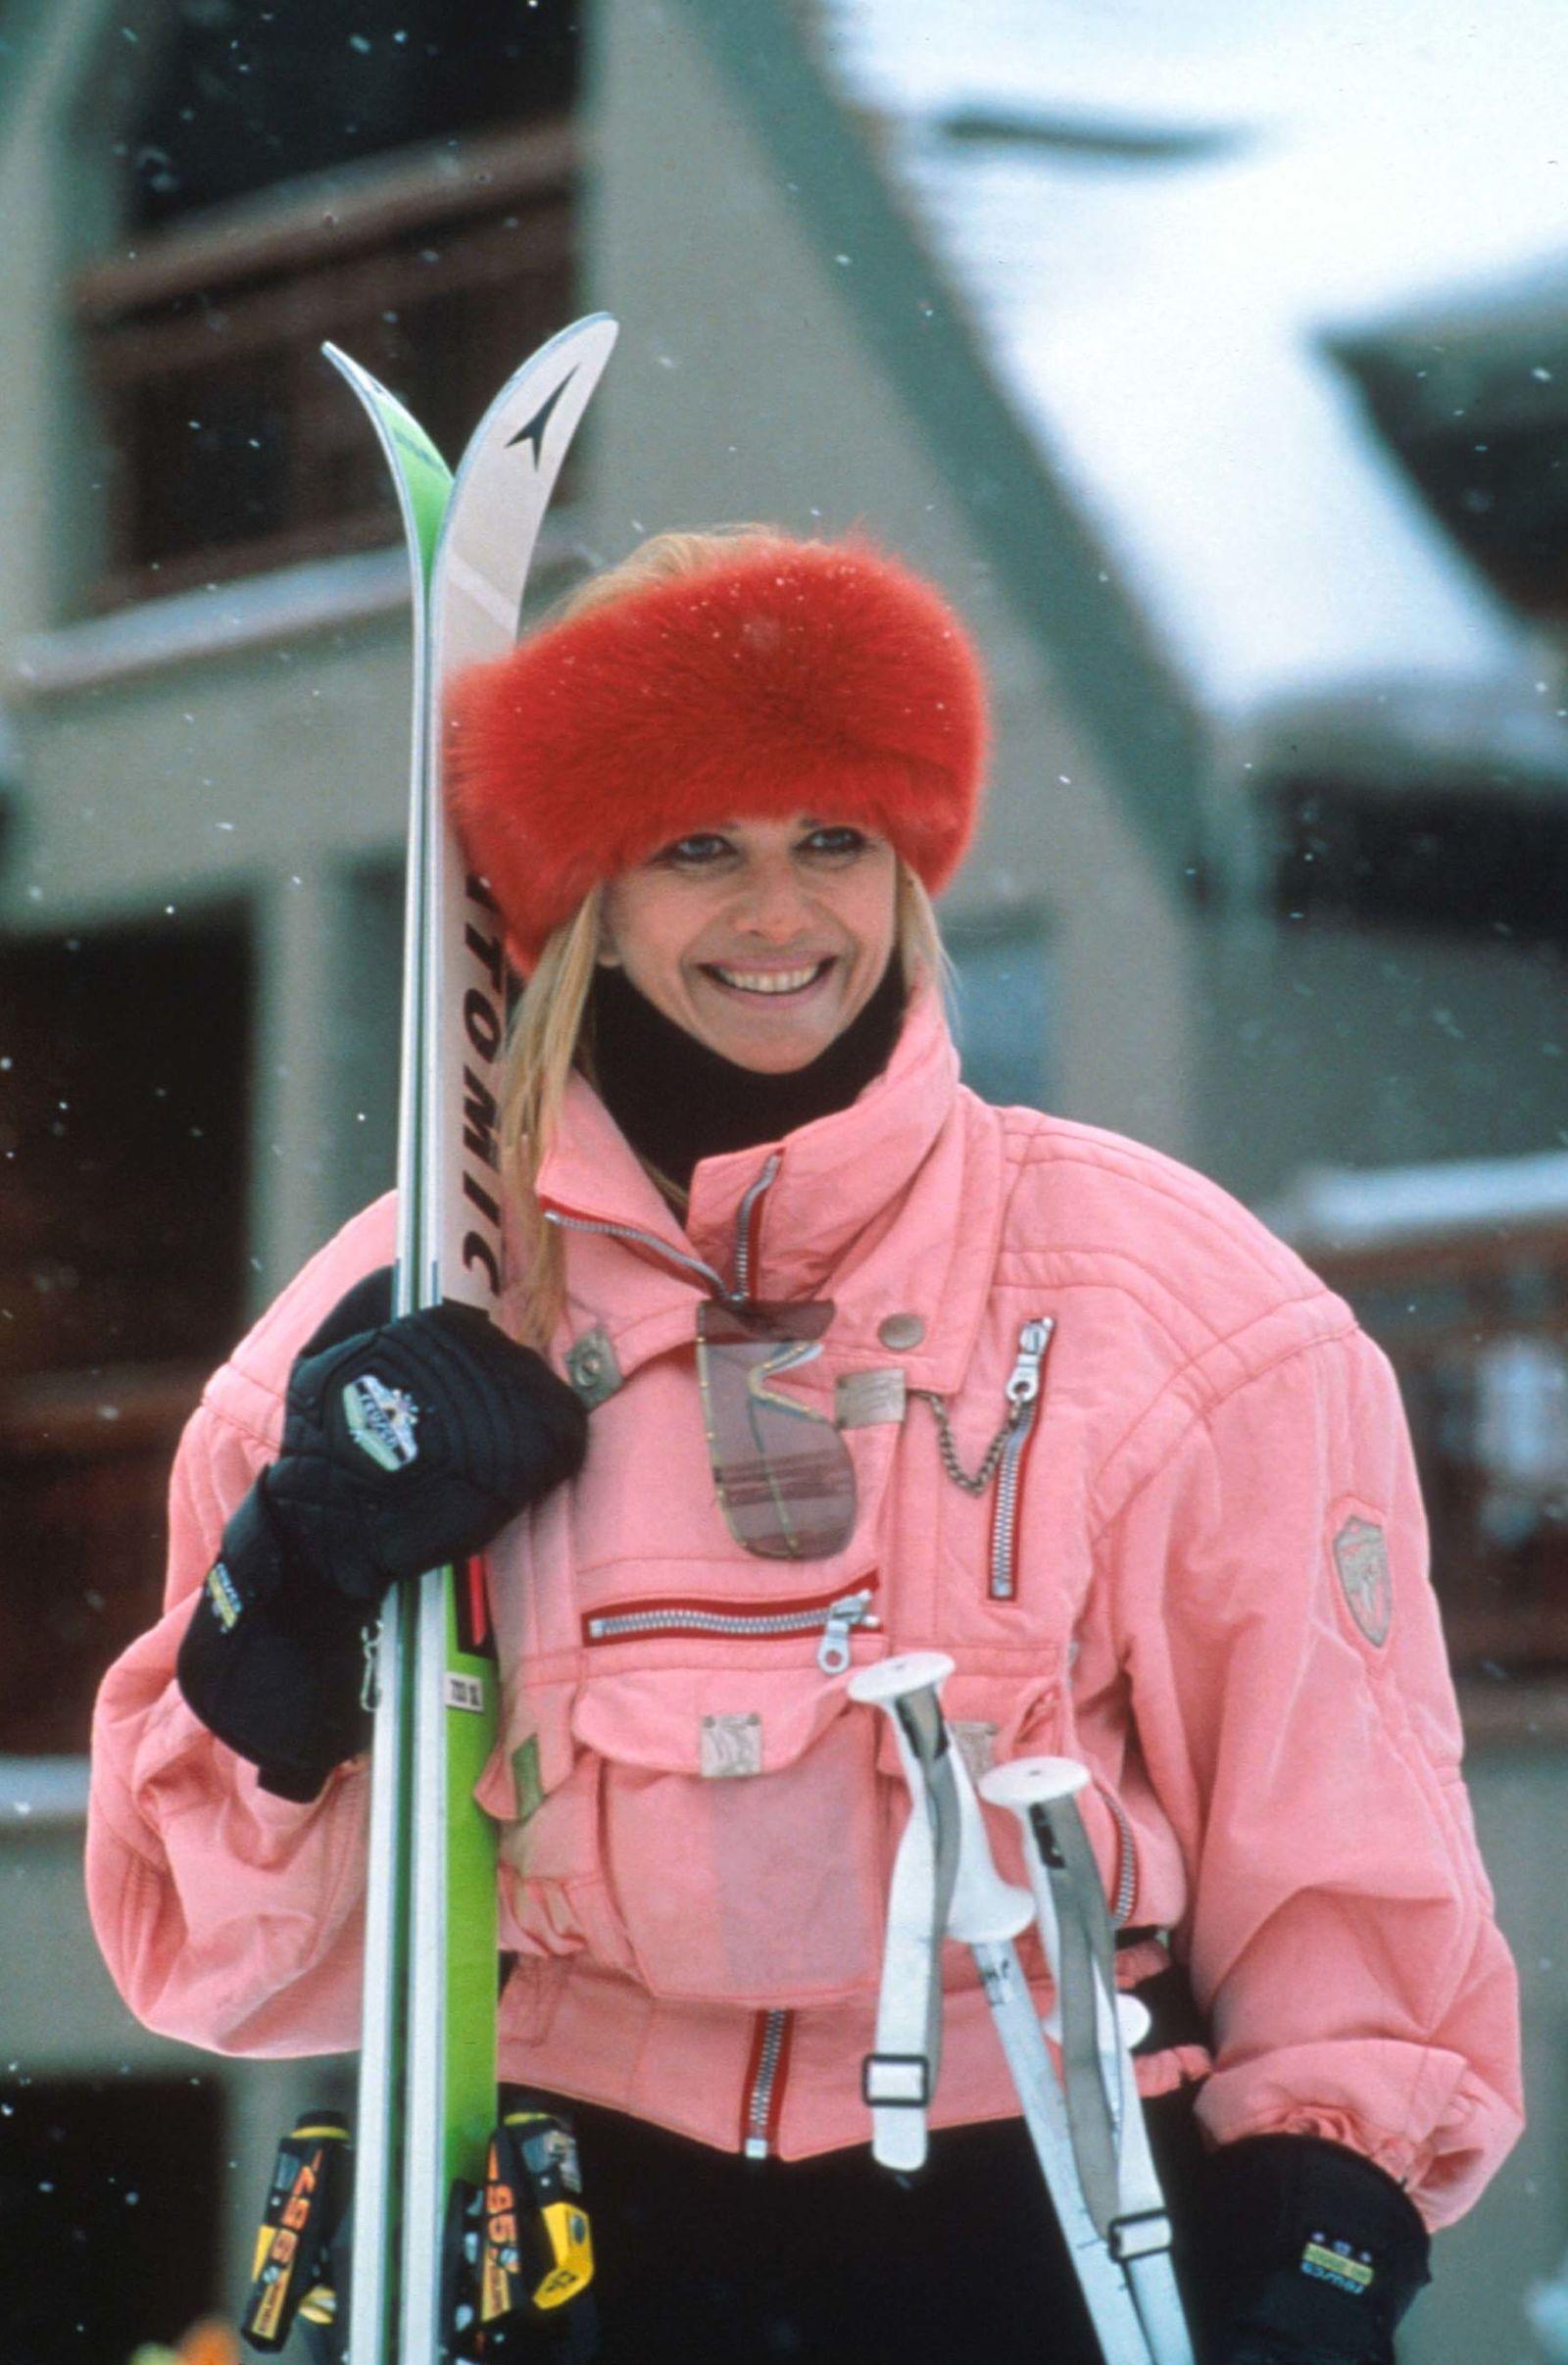 The Most Iconic Ski Bunny Looks of All Time   Ivana trump ... Ivana Trump Skiing